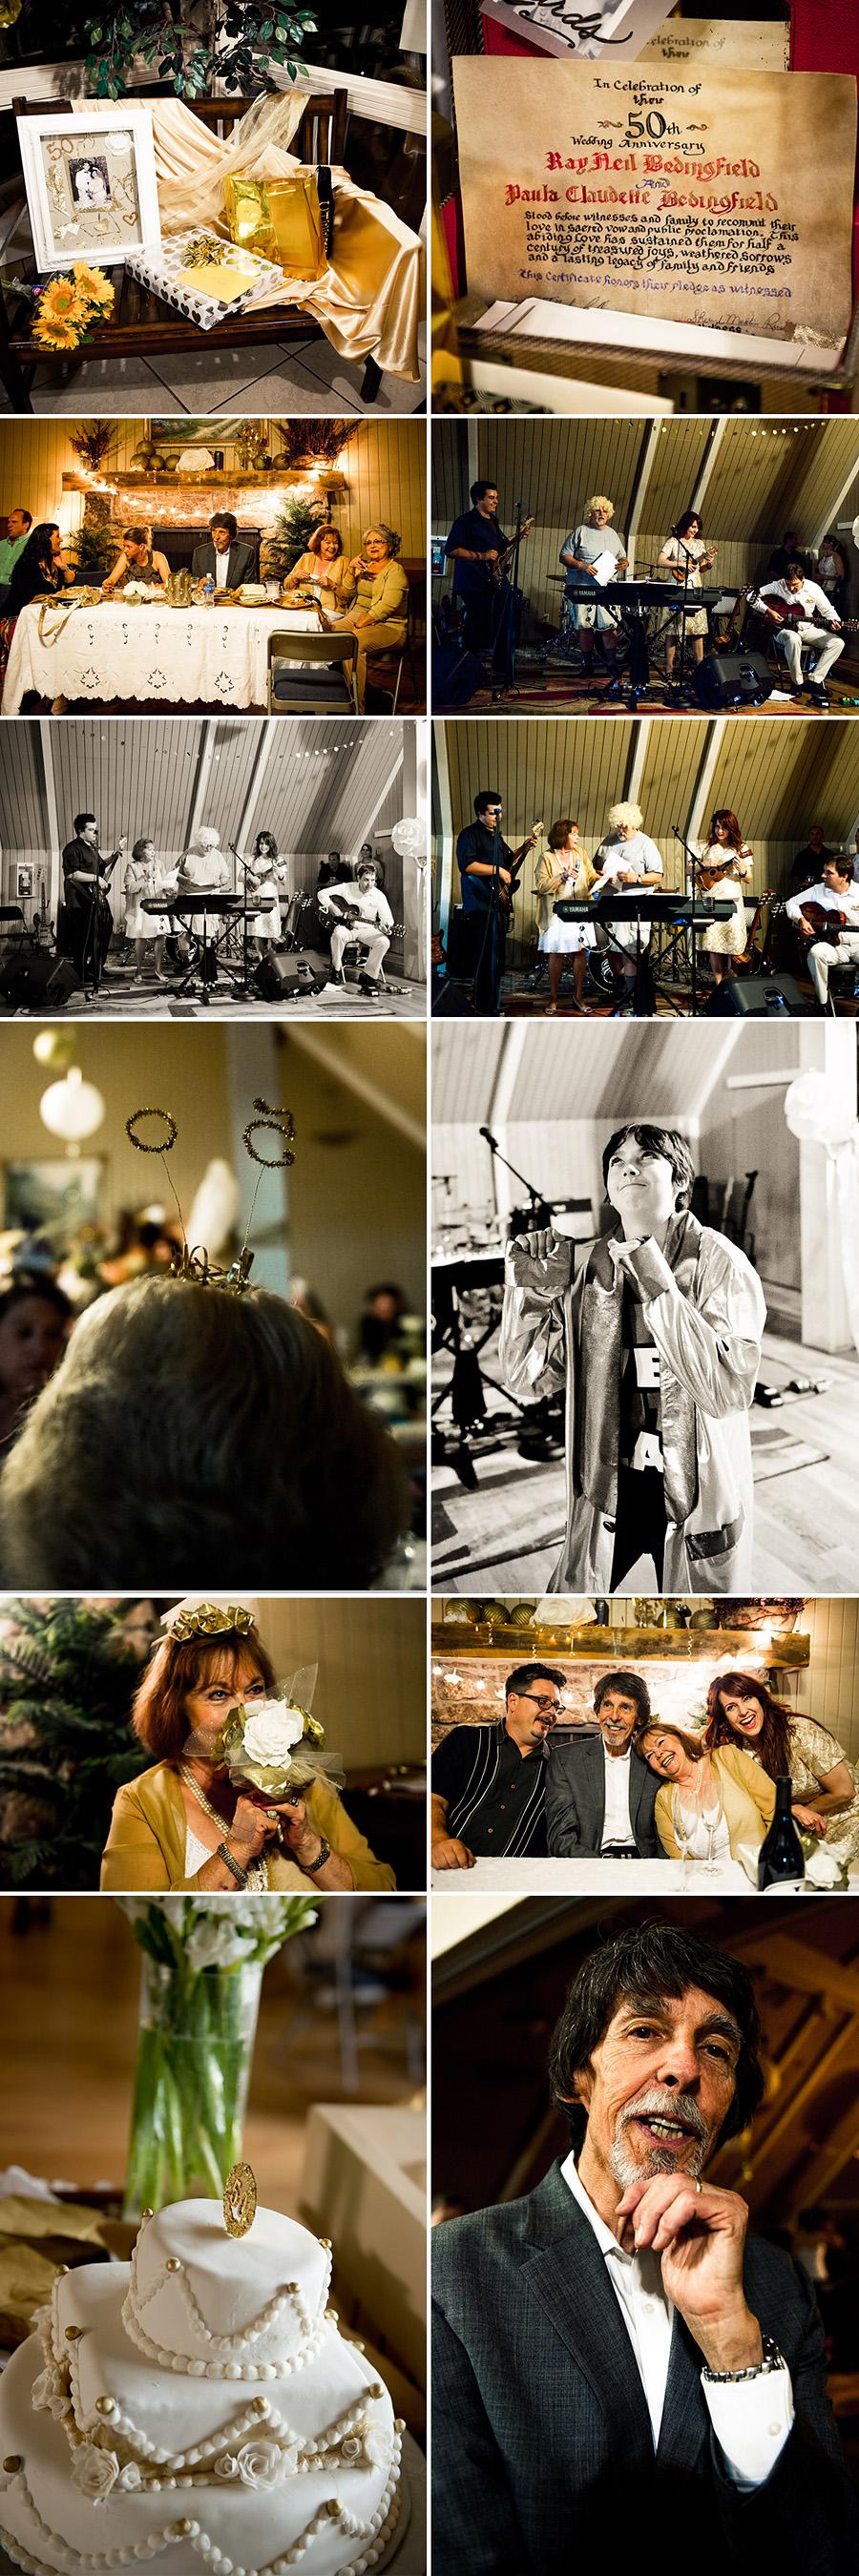 anniversary photos Bedingfield collage 13